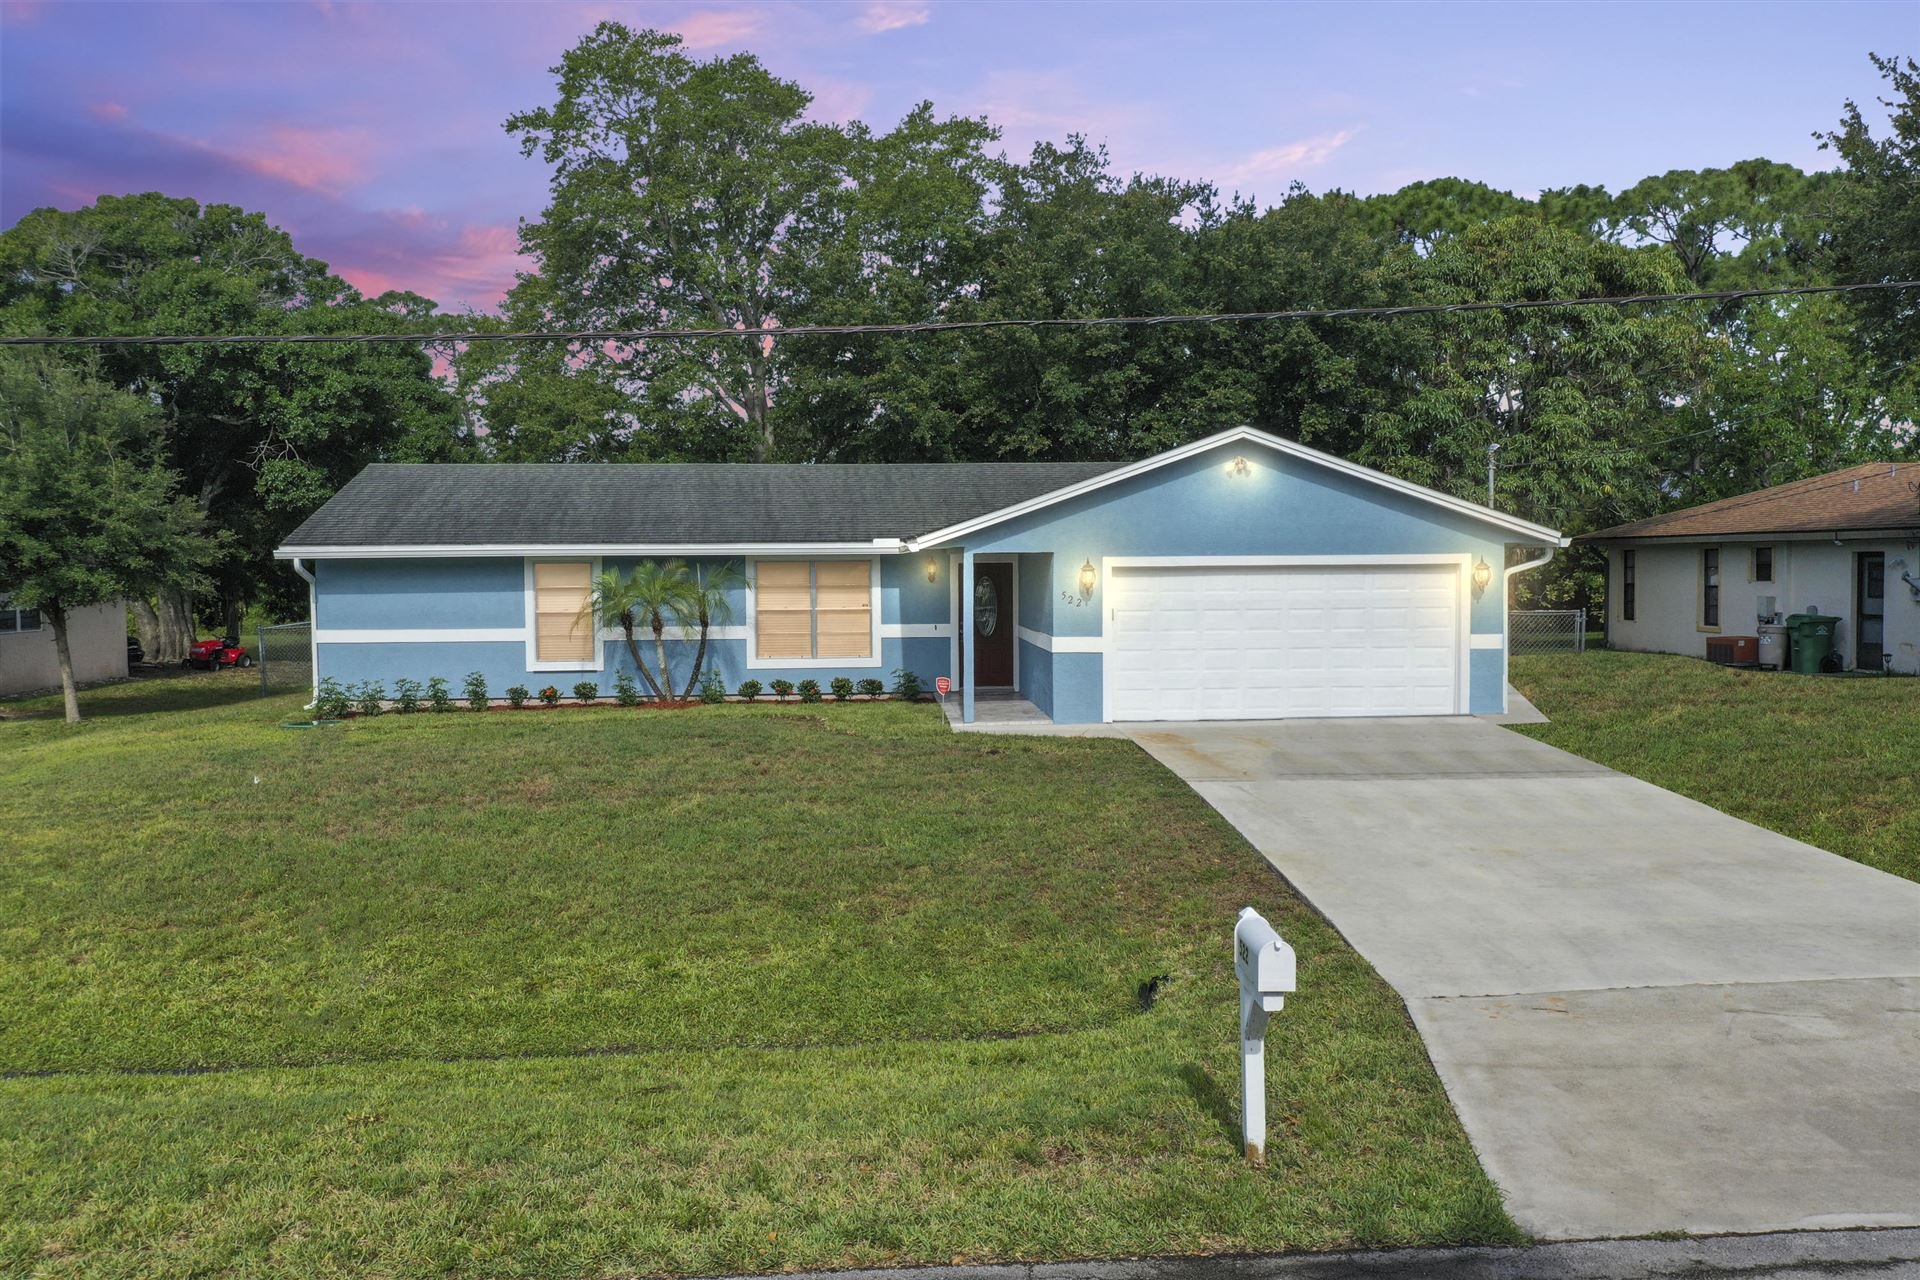 522 NW Avens Street, Port Saint Lucie, FL 34983 - MLS#: RX-10712711